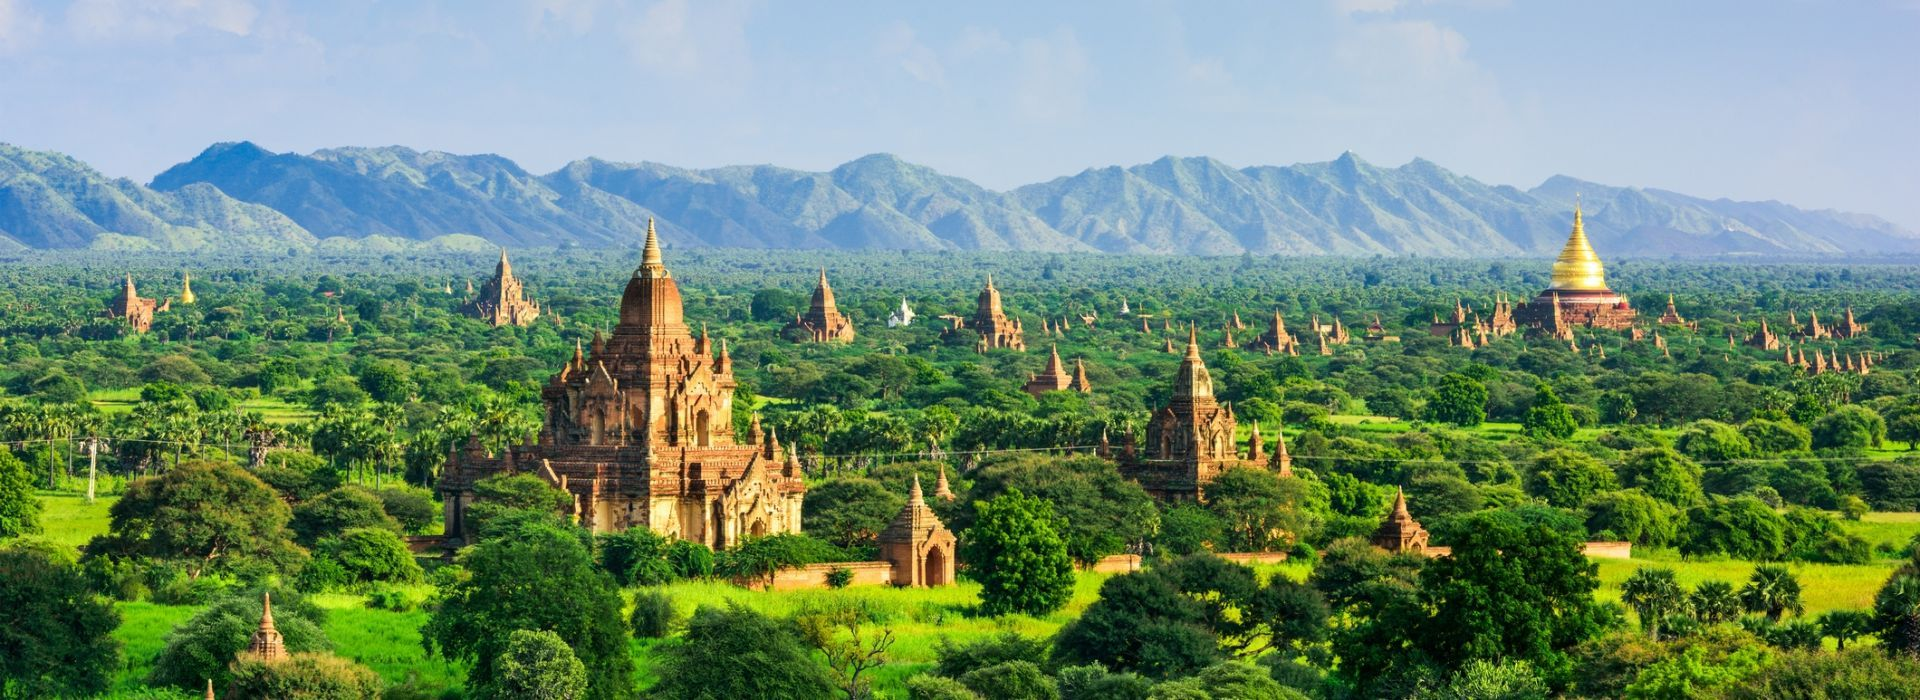 Beaches Tours in Myanmar